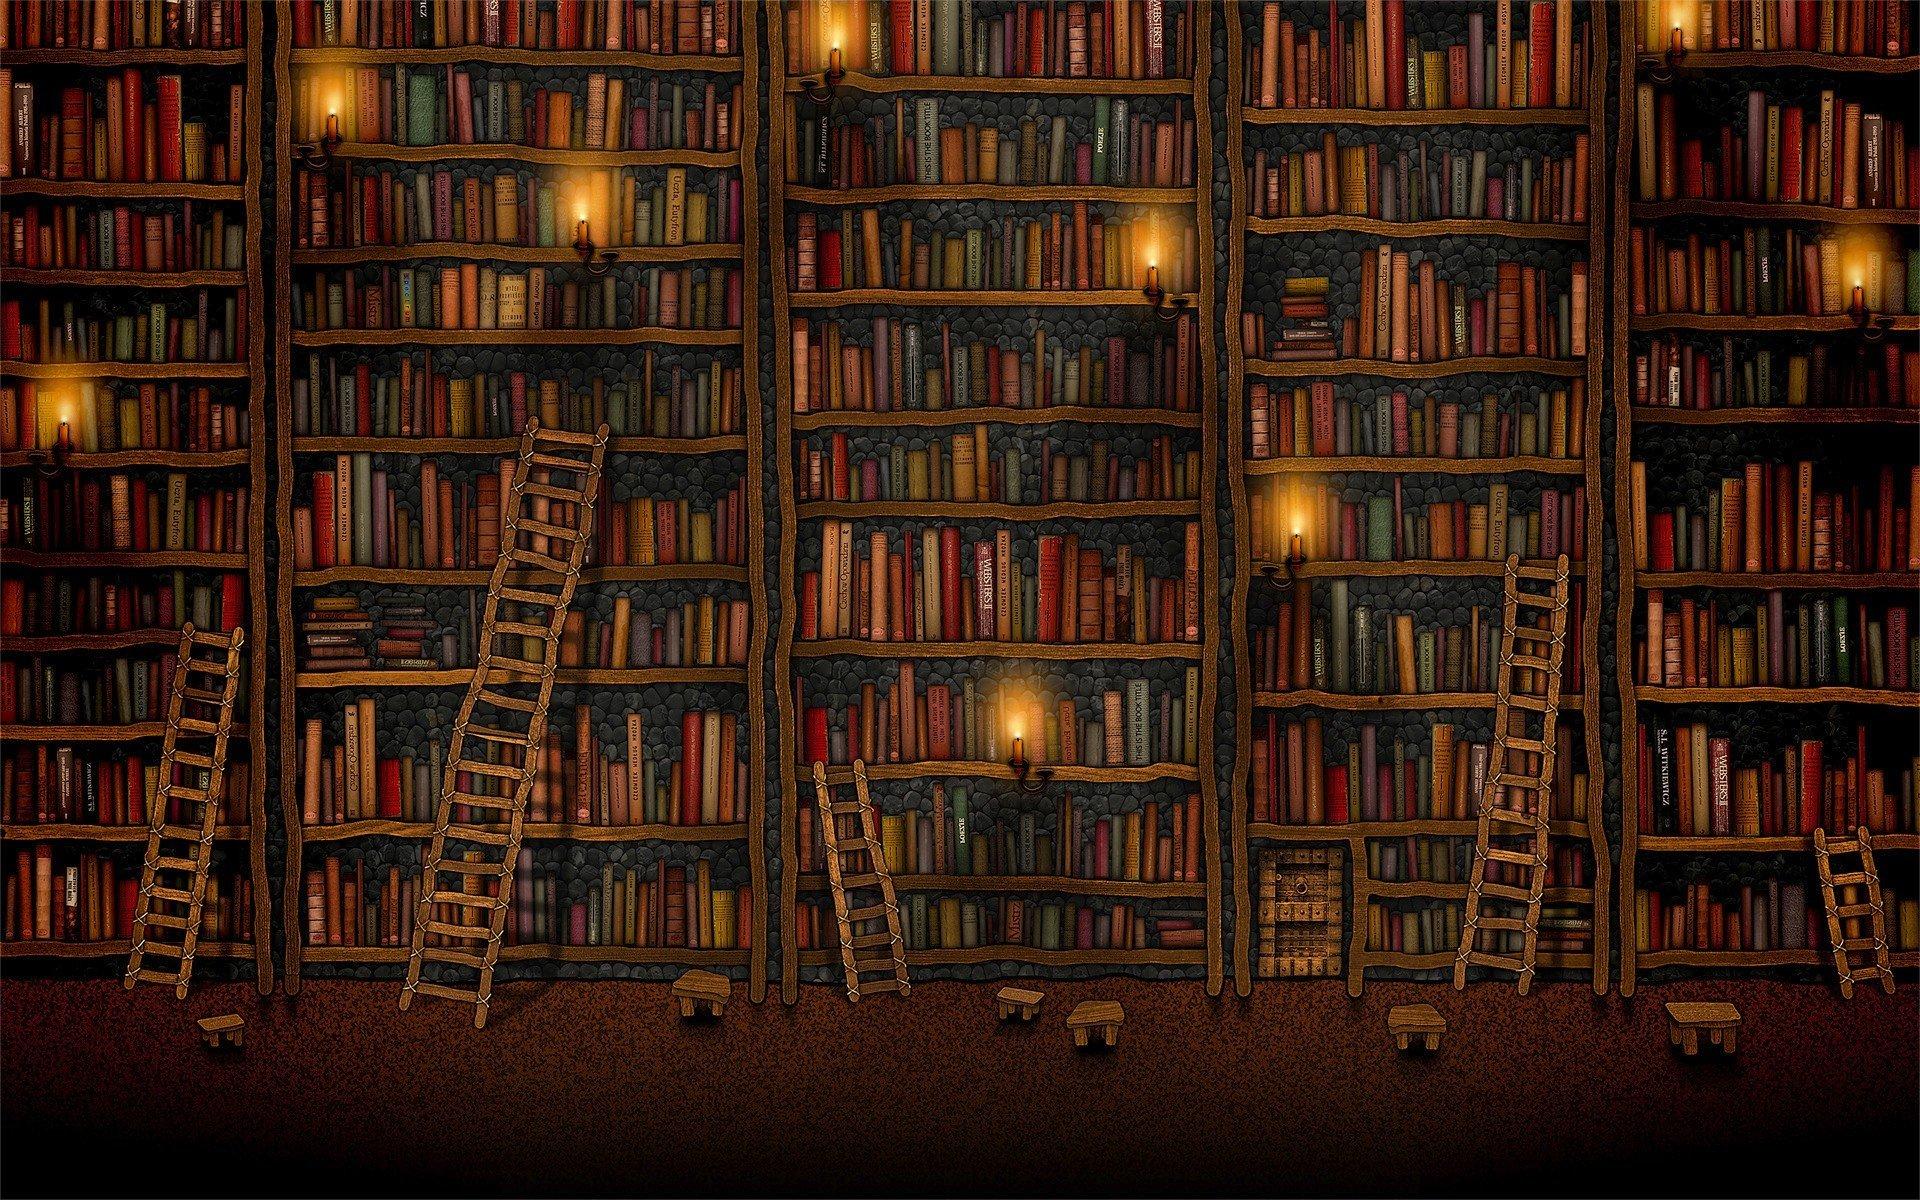 books, Vladstudio, Shelves, Library, Ladders, Candles Wallpaper